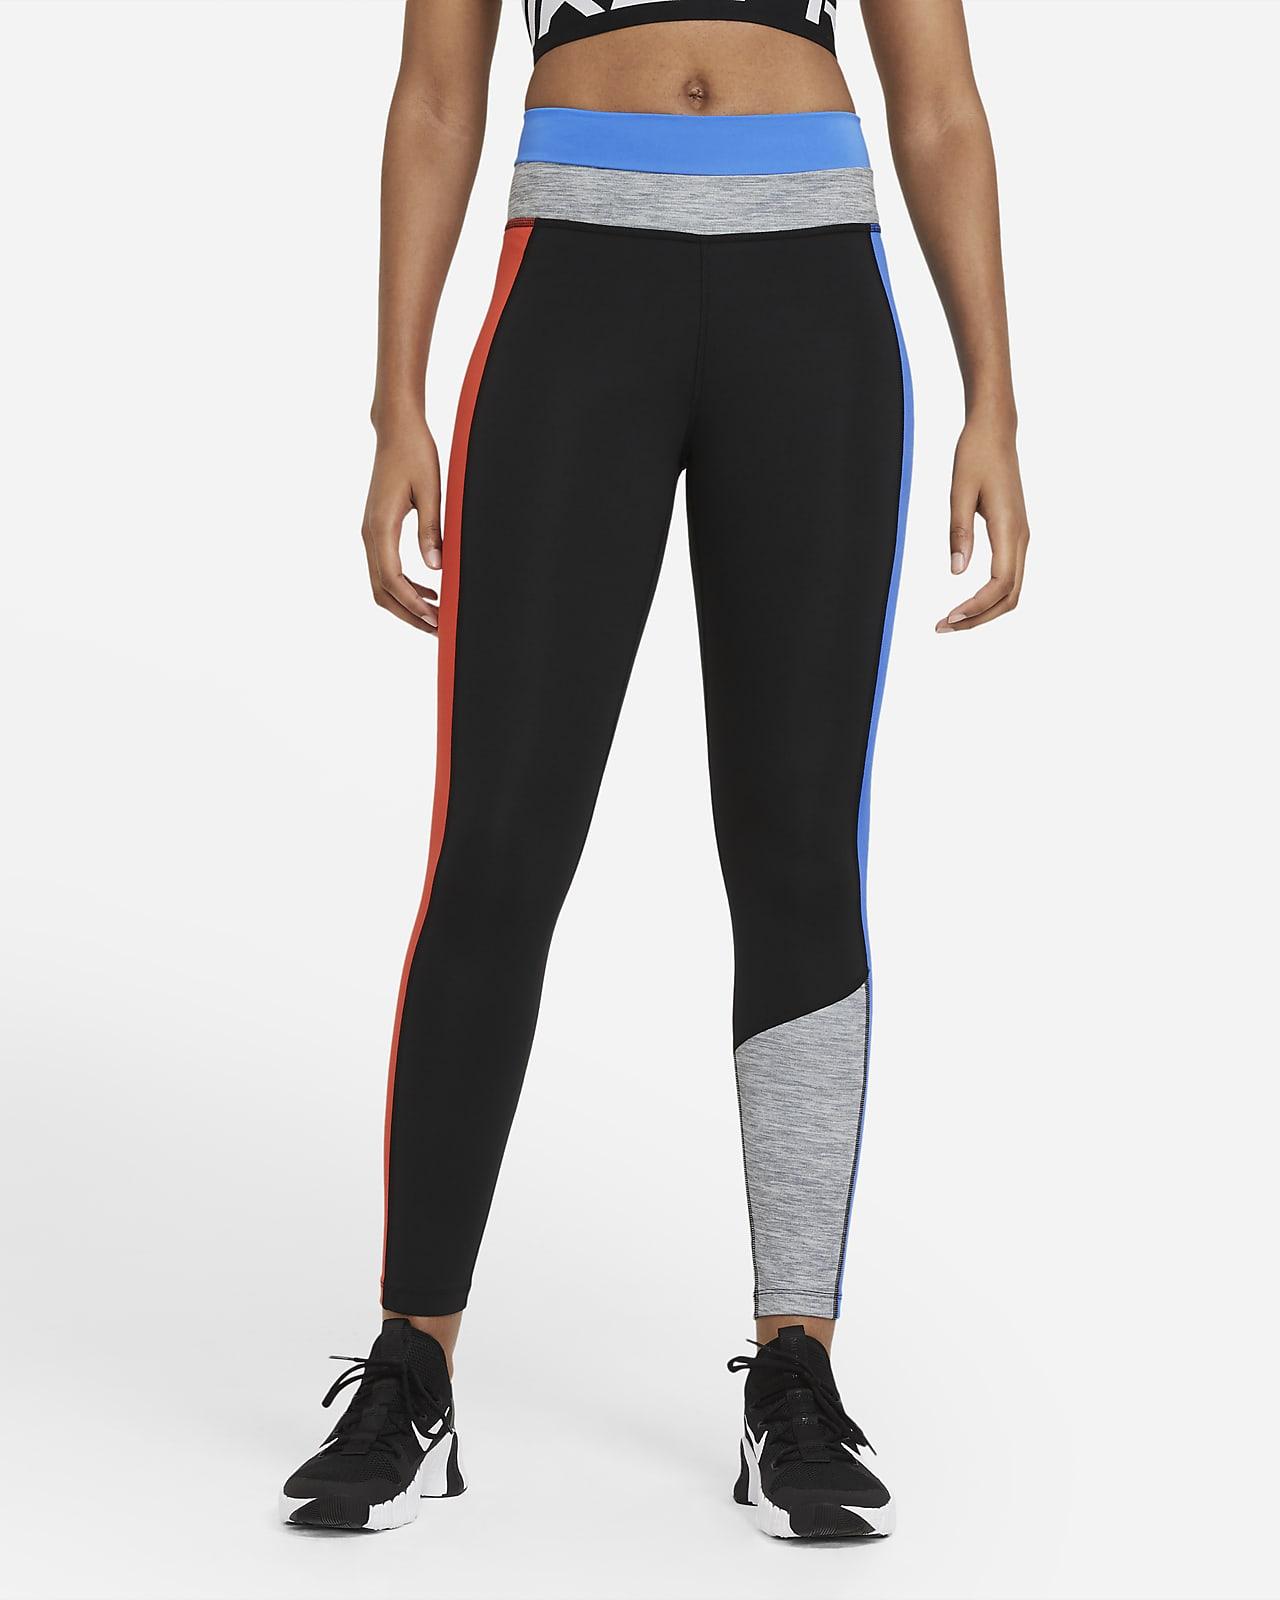 Leggings de 7/8 de bloques de color para mujer Nike One